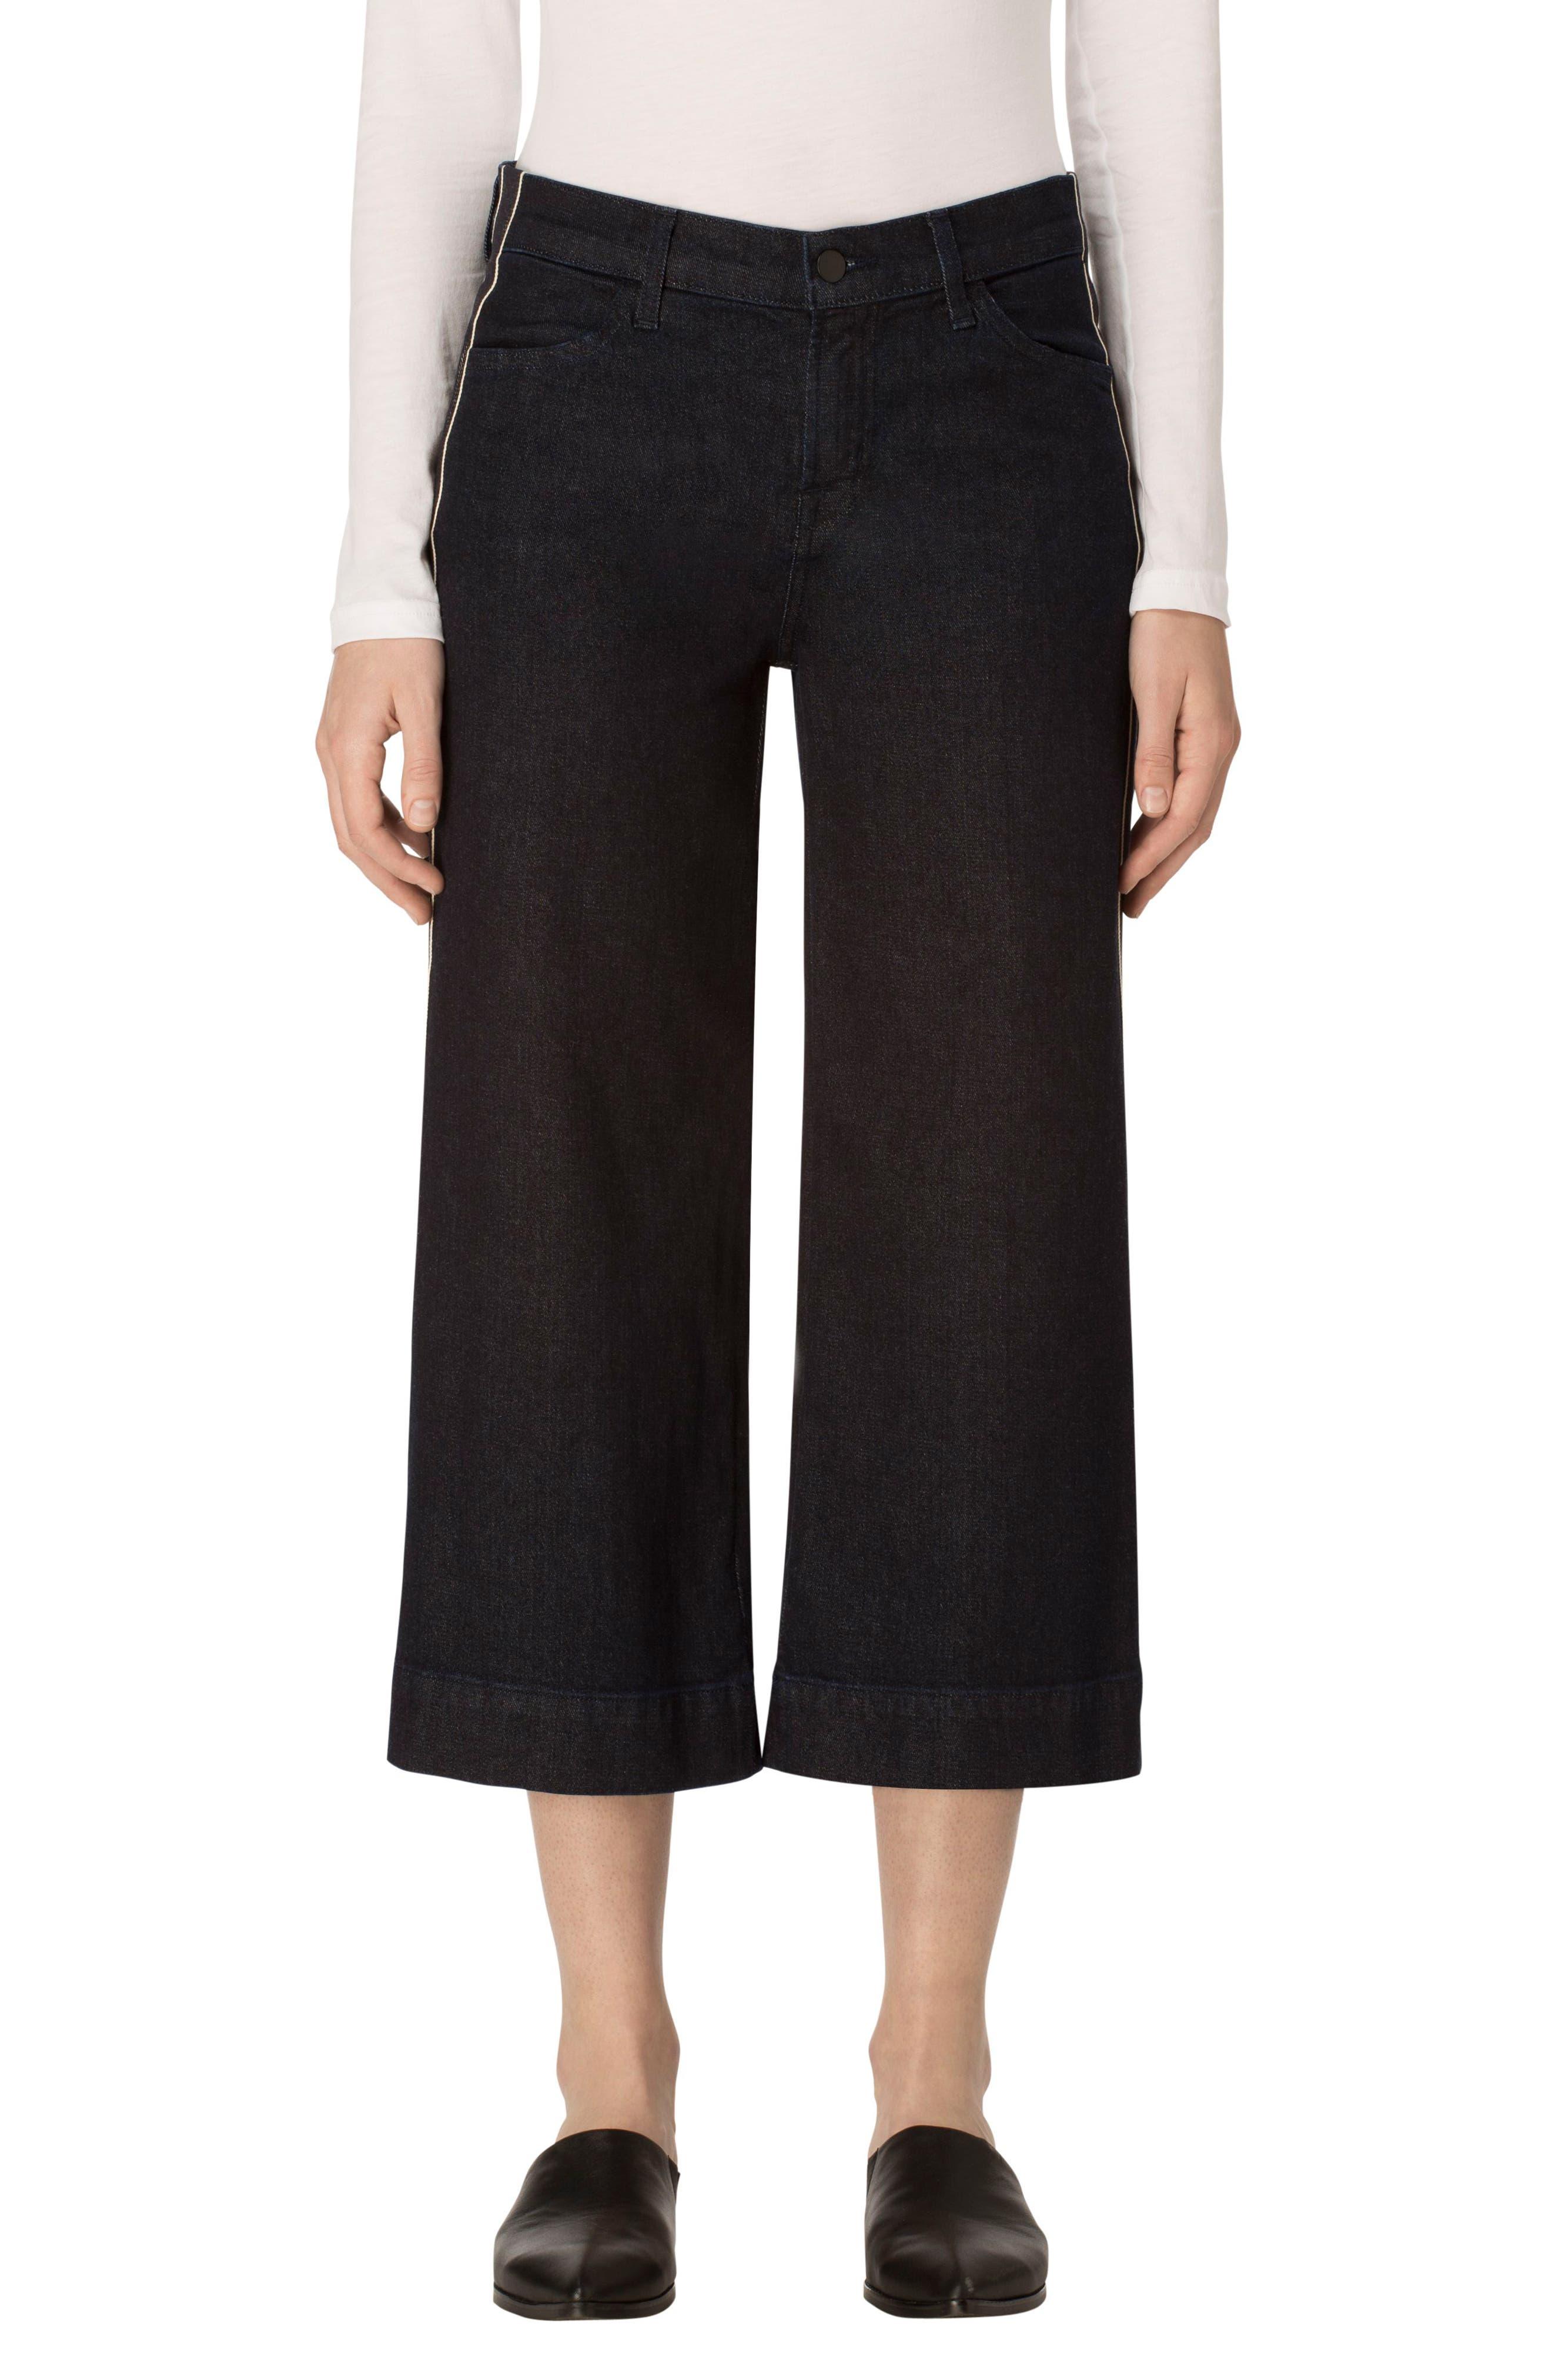 Alternate Image 1 Selected - J Brand Liza Flare Leg Culottes